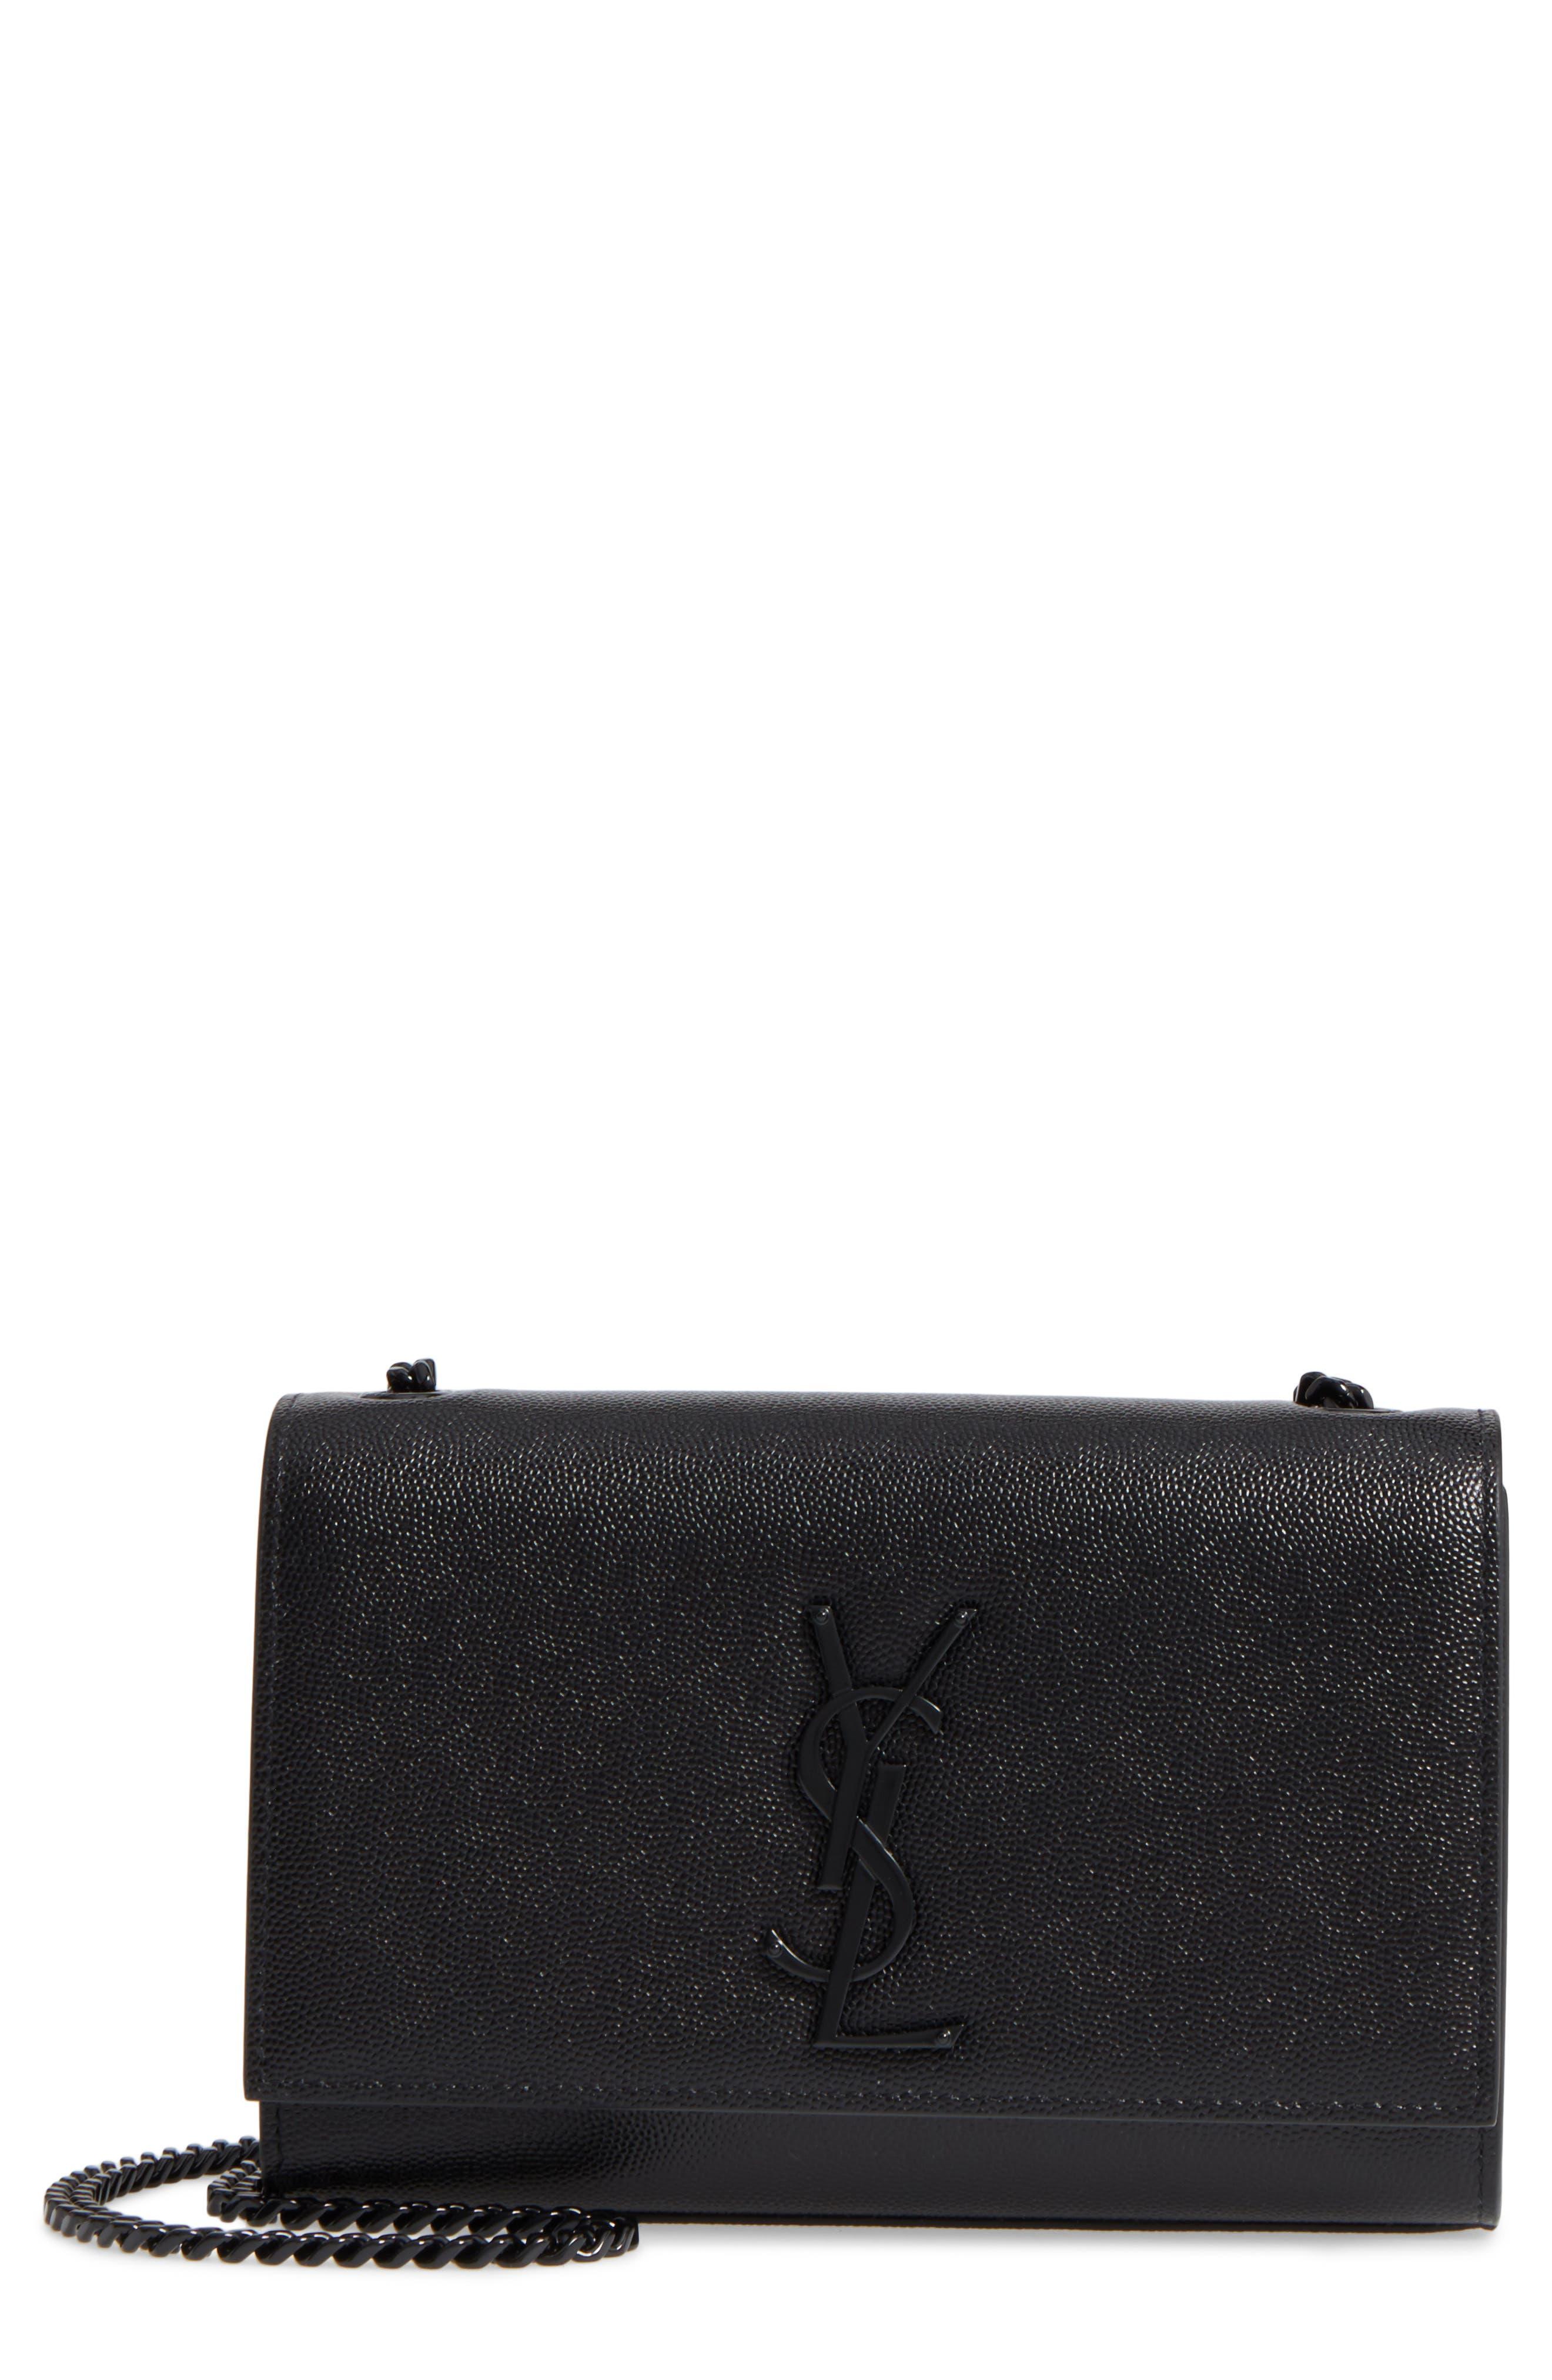 SAINT LAURENT Small Kate Leather Shoulder Bag, Main, color, BLACK